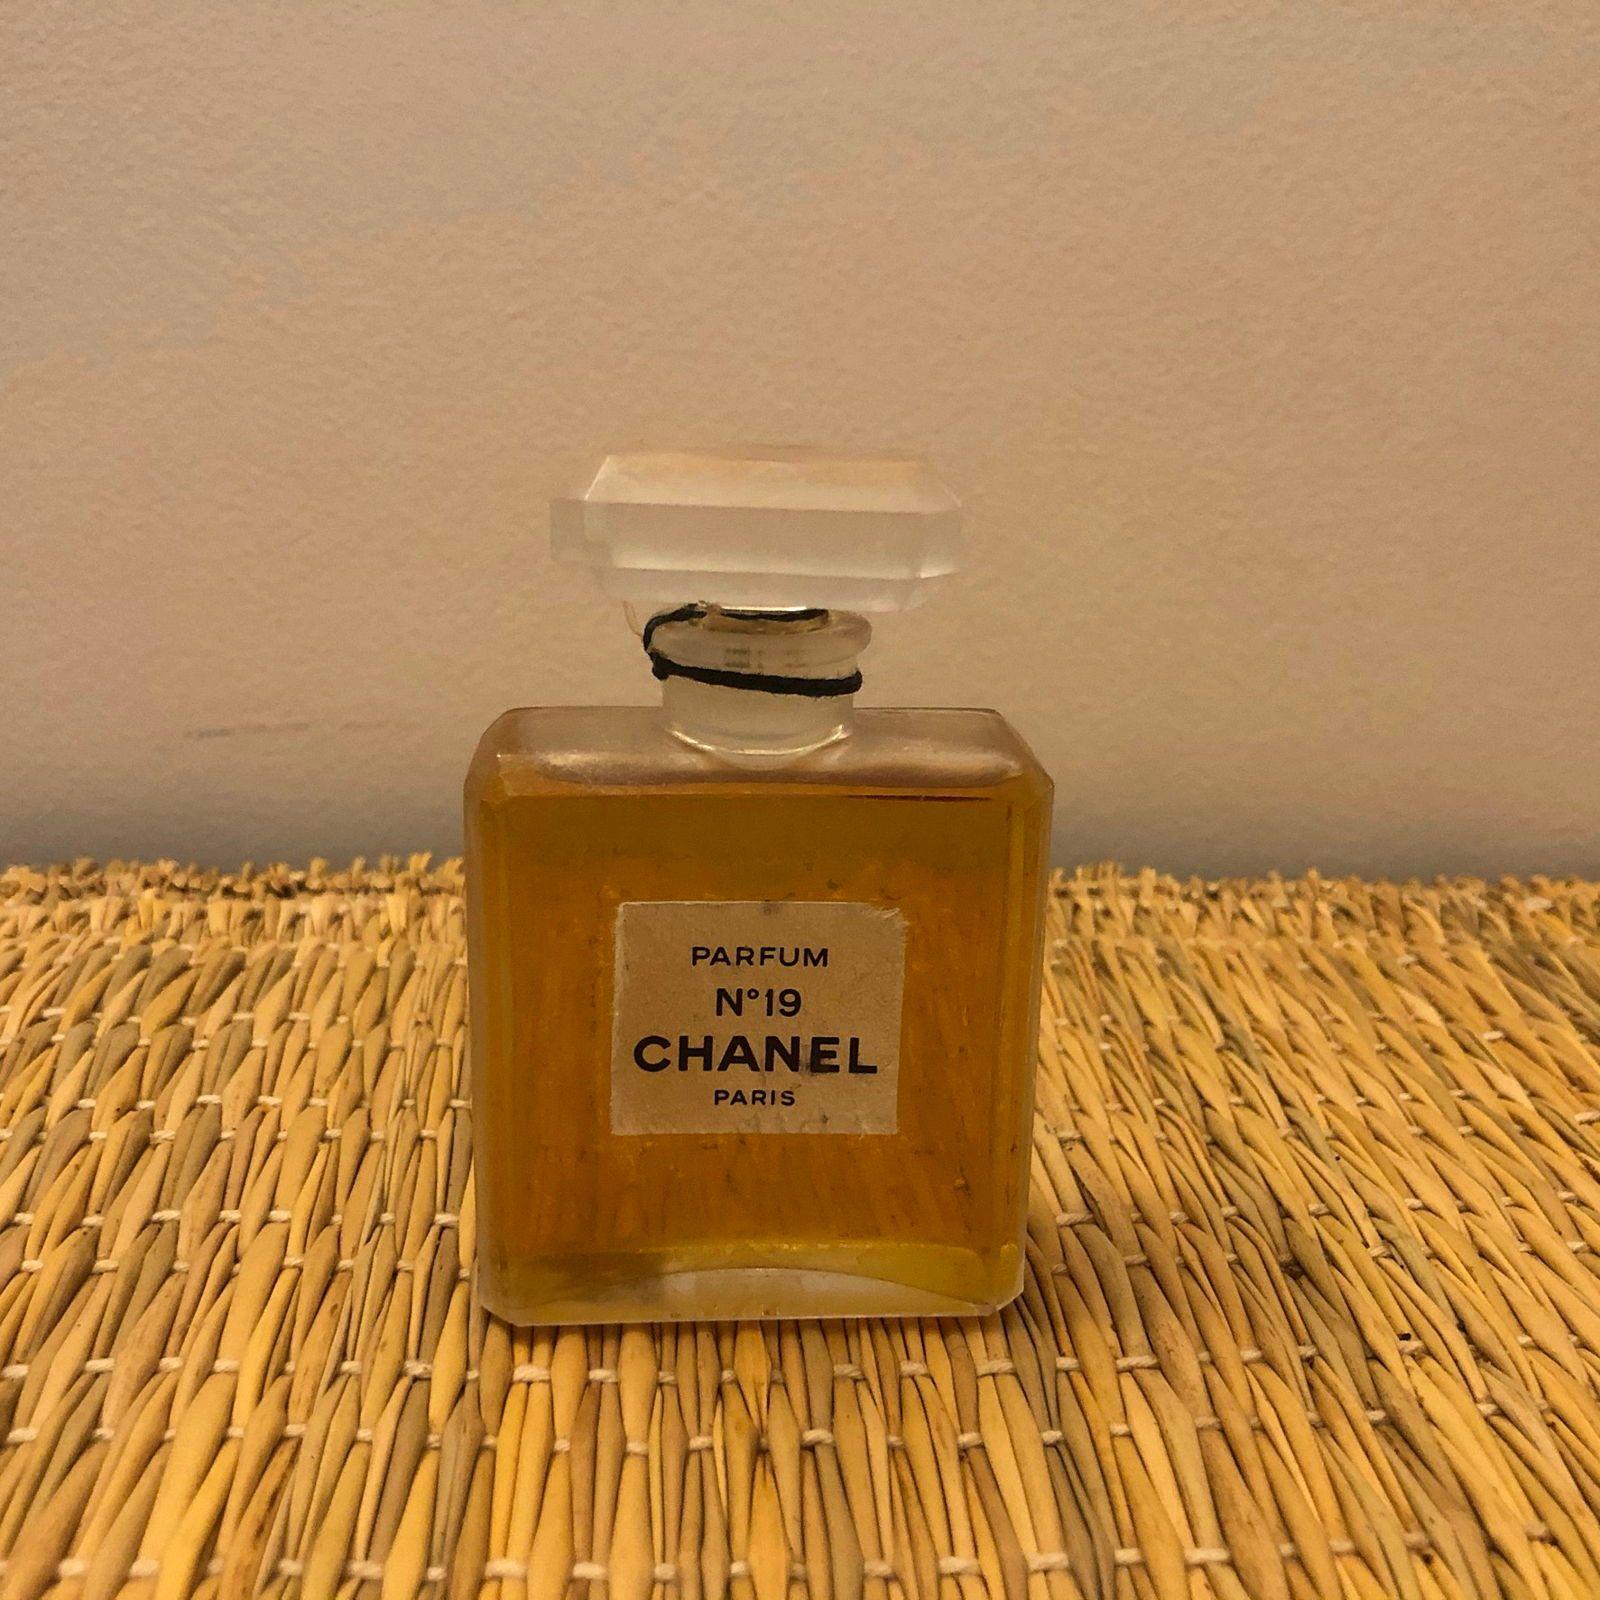 Vends ancien flacon Chanel n°19